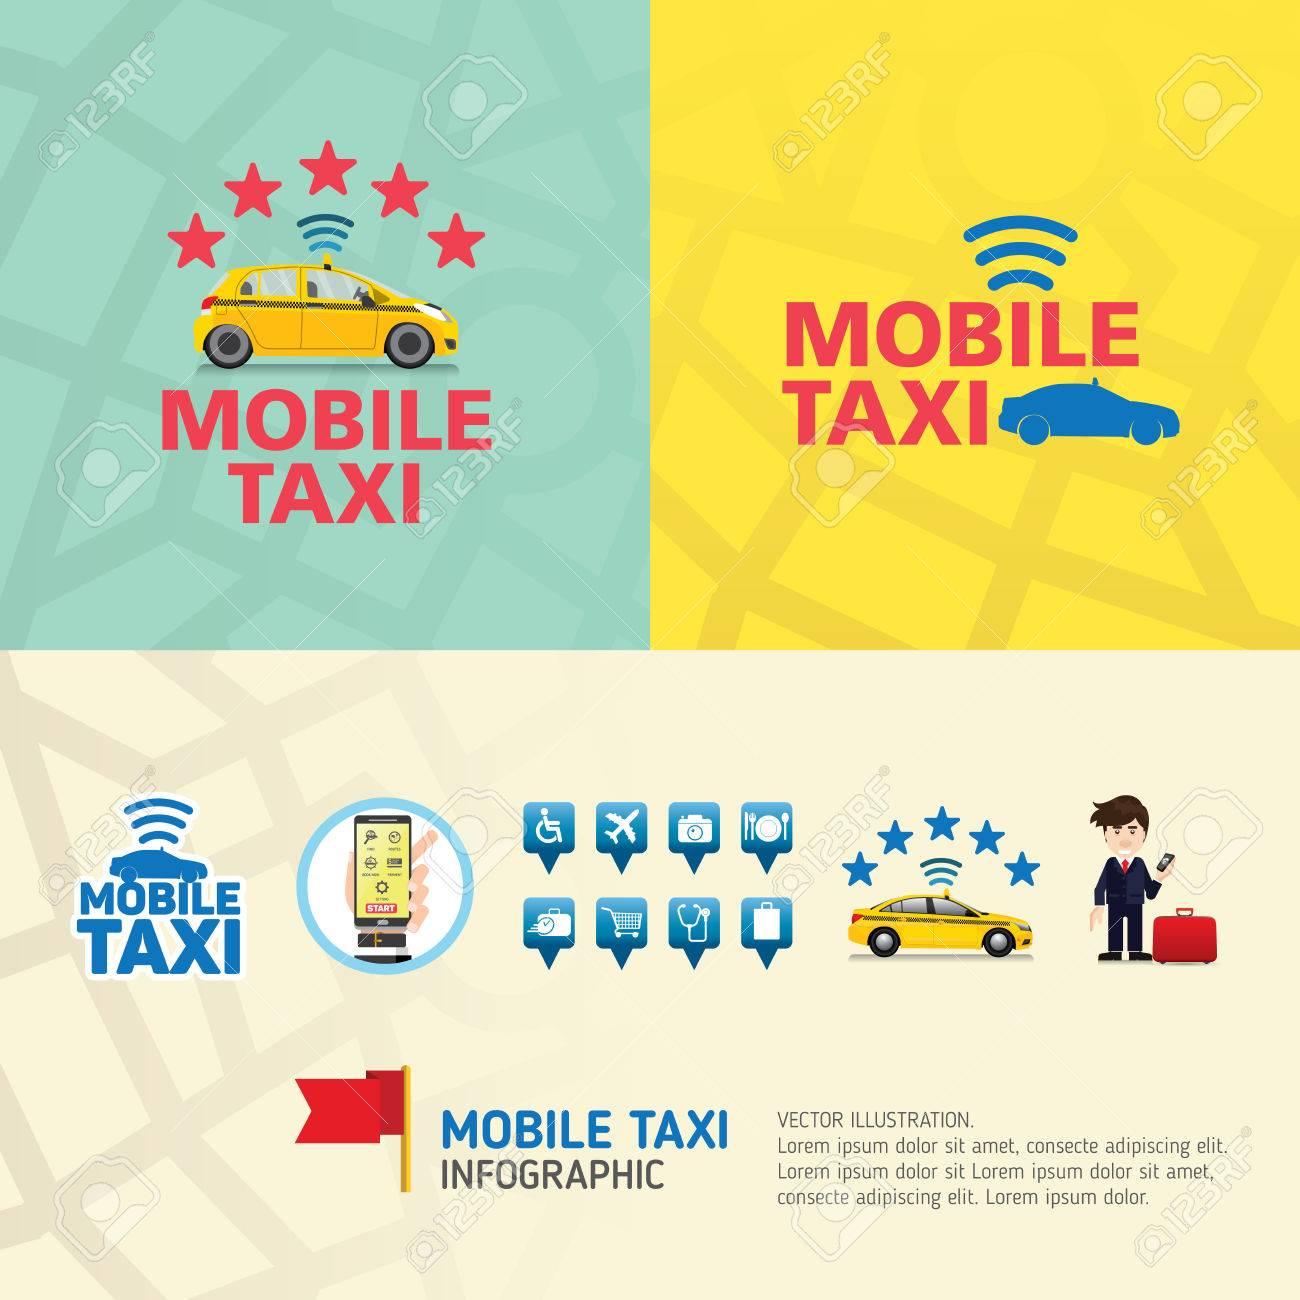 Public taxi service application  Mobile Taxi business service